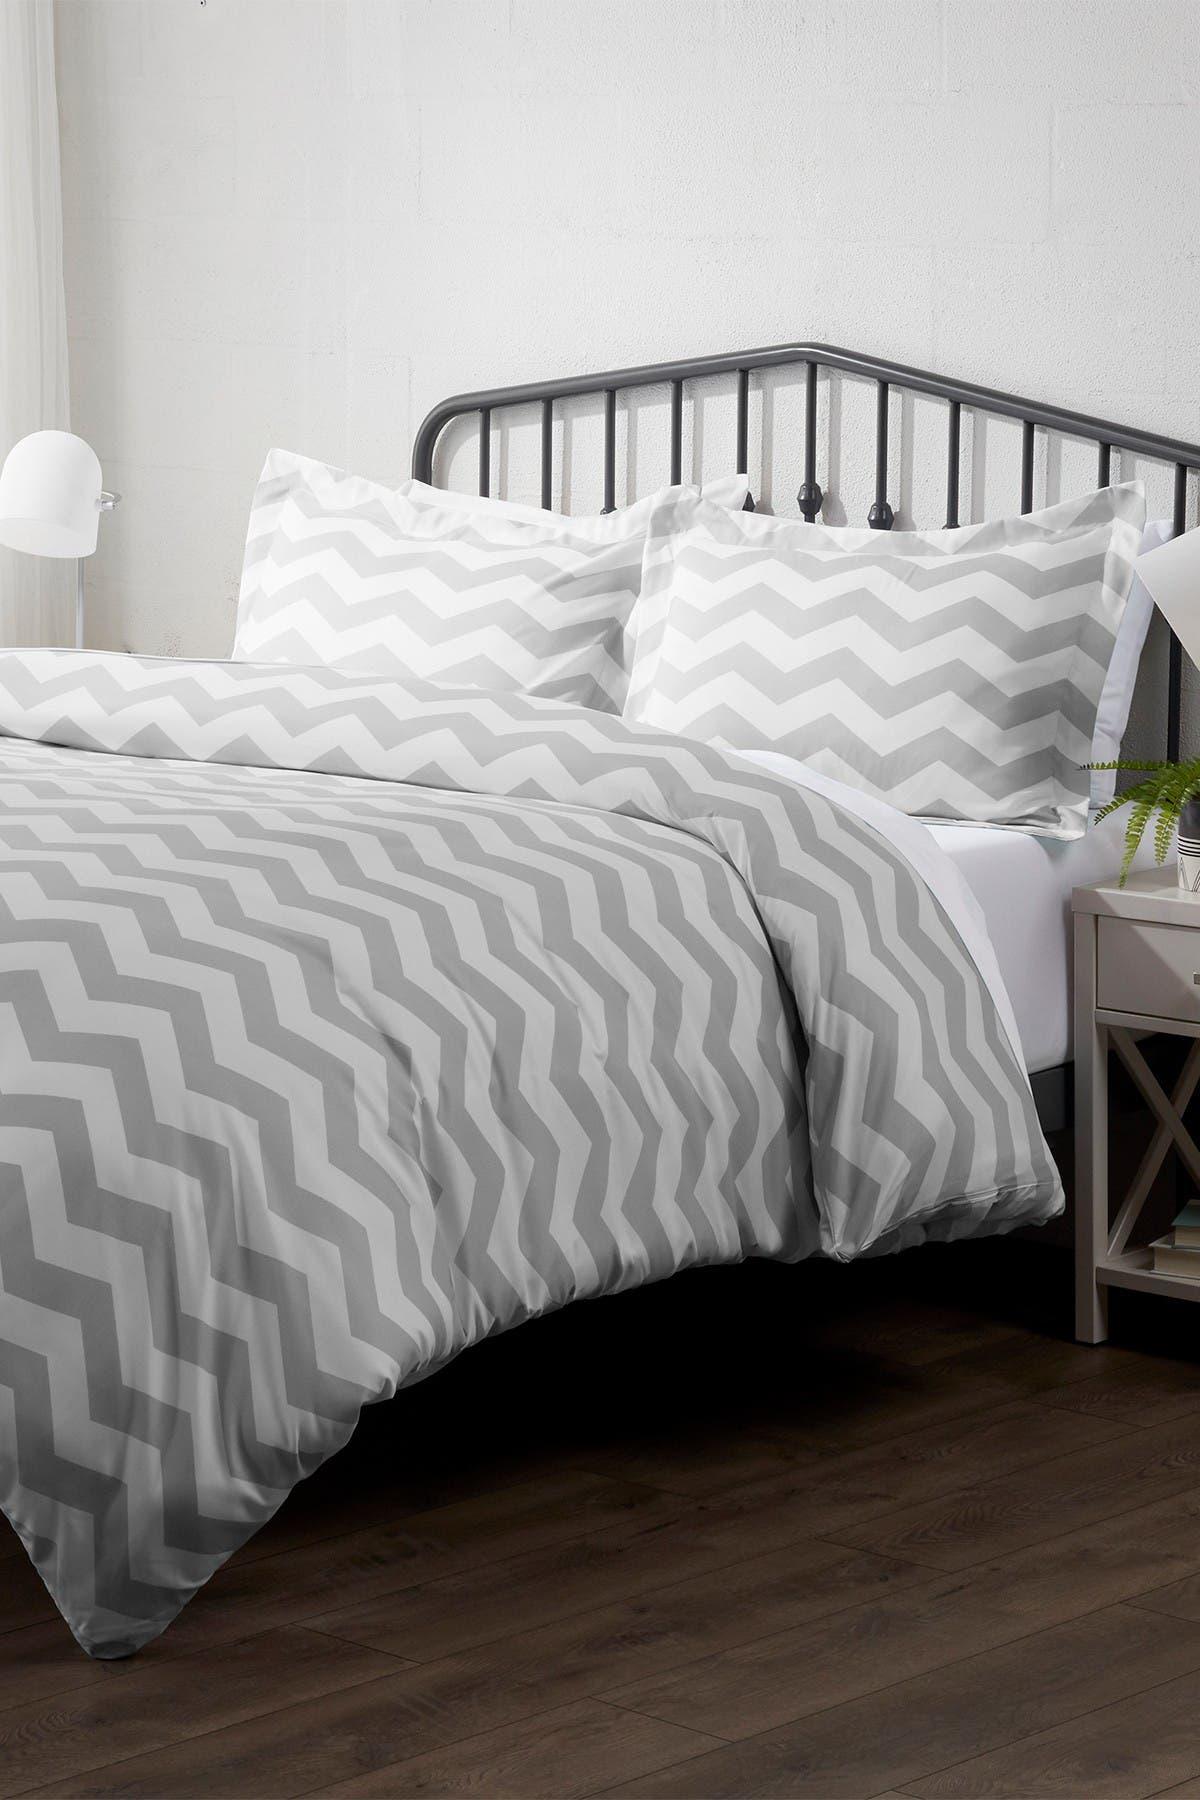 Image of IENJOY HOME Home Spun Premium Ultra Soft Arrow Pattern 3-Piece King Duvet Cover Set - Gray